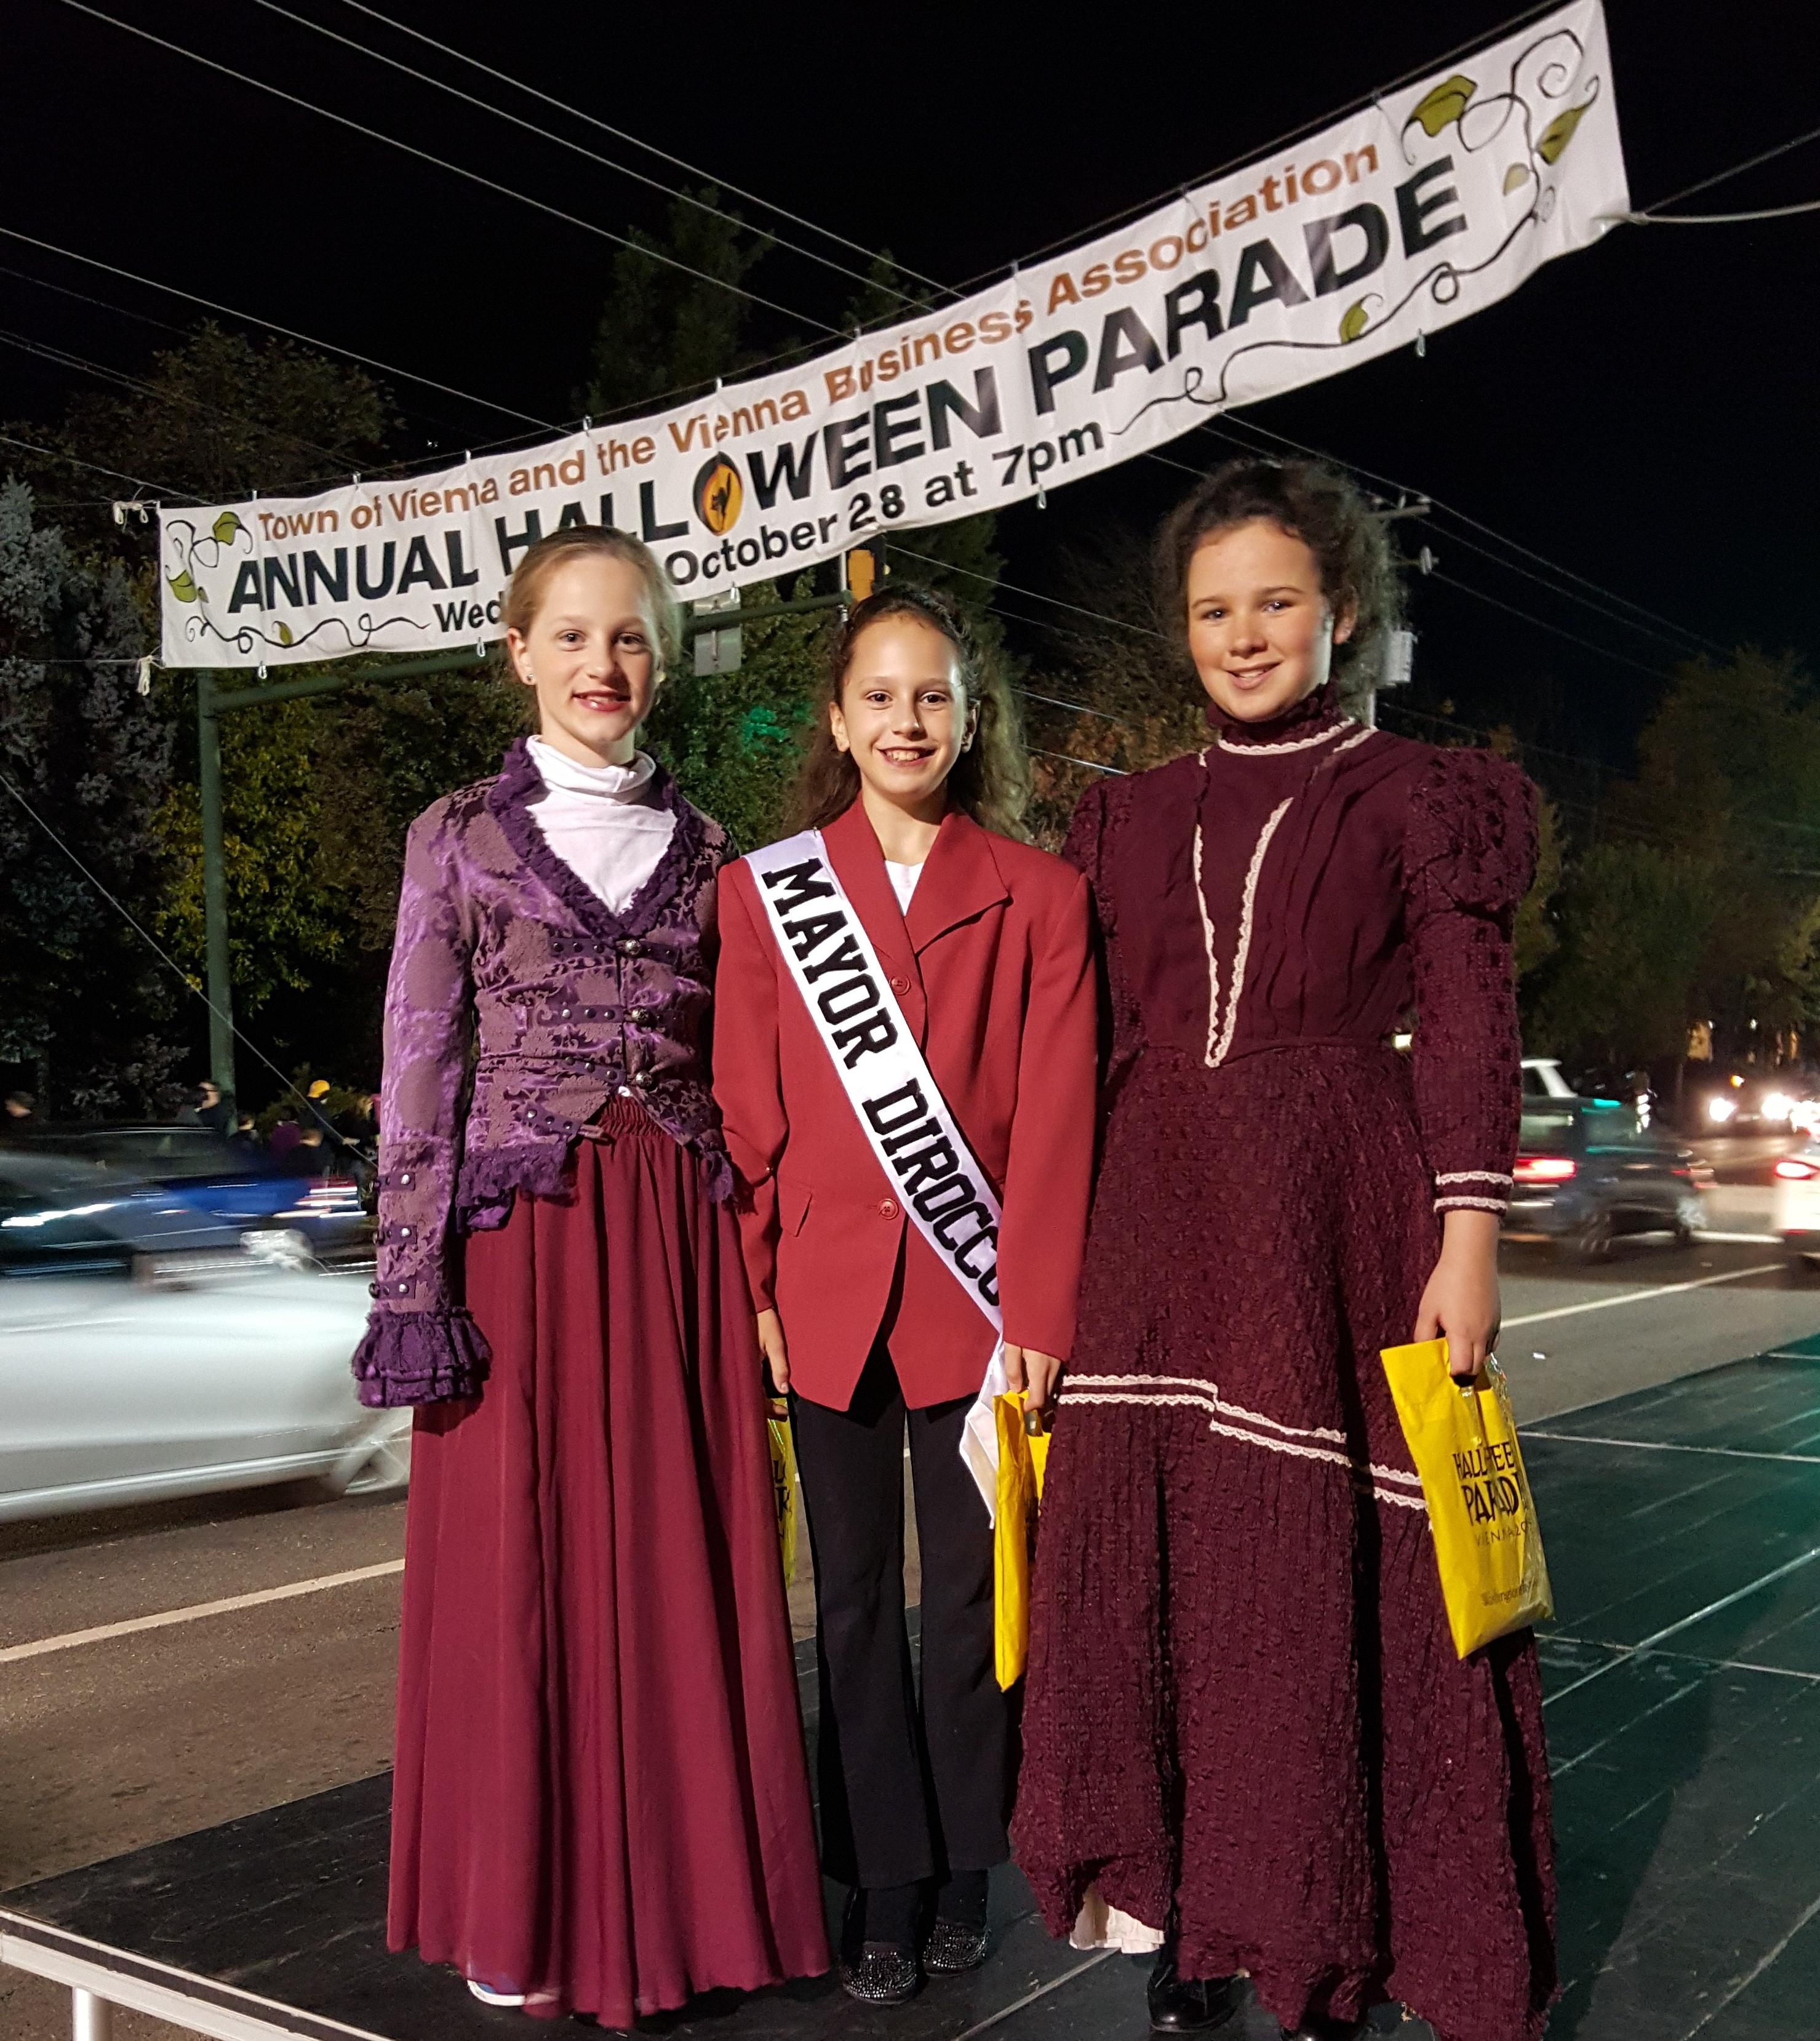 halloween parade vienna business associationva - Vienna Va Halloween Parade